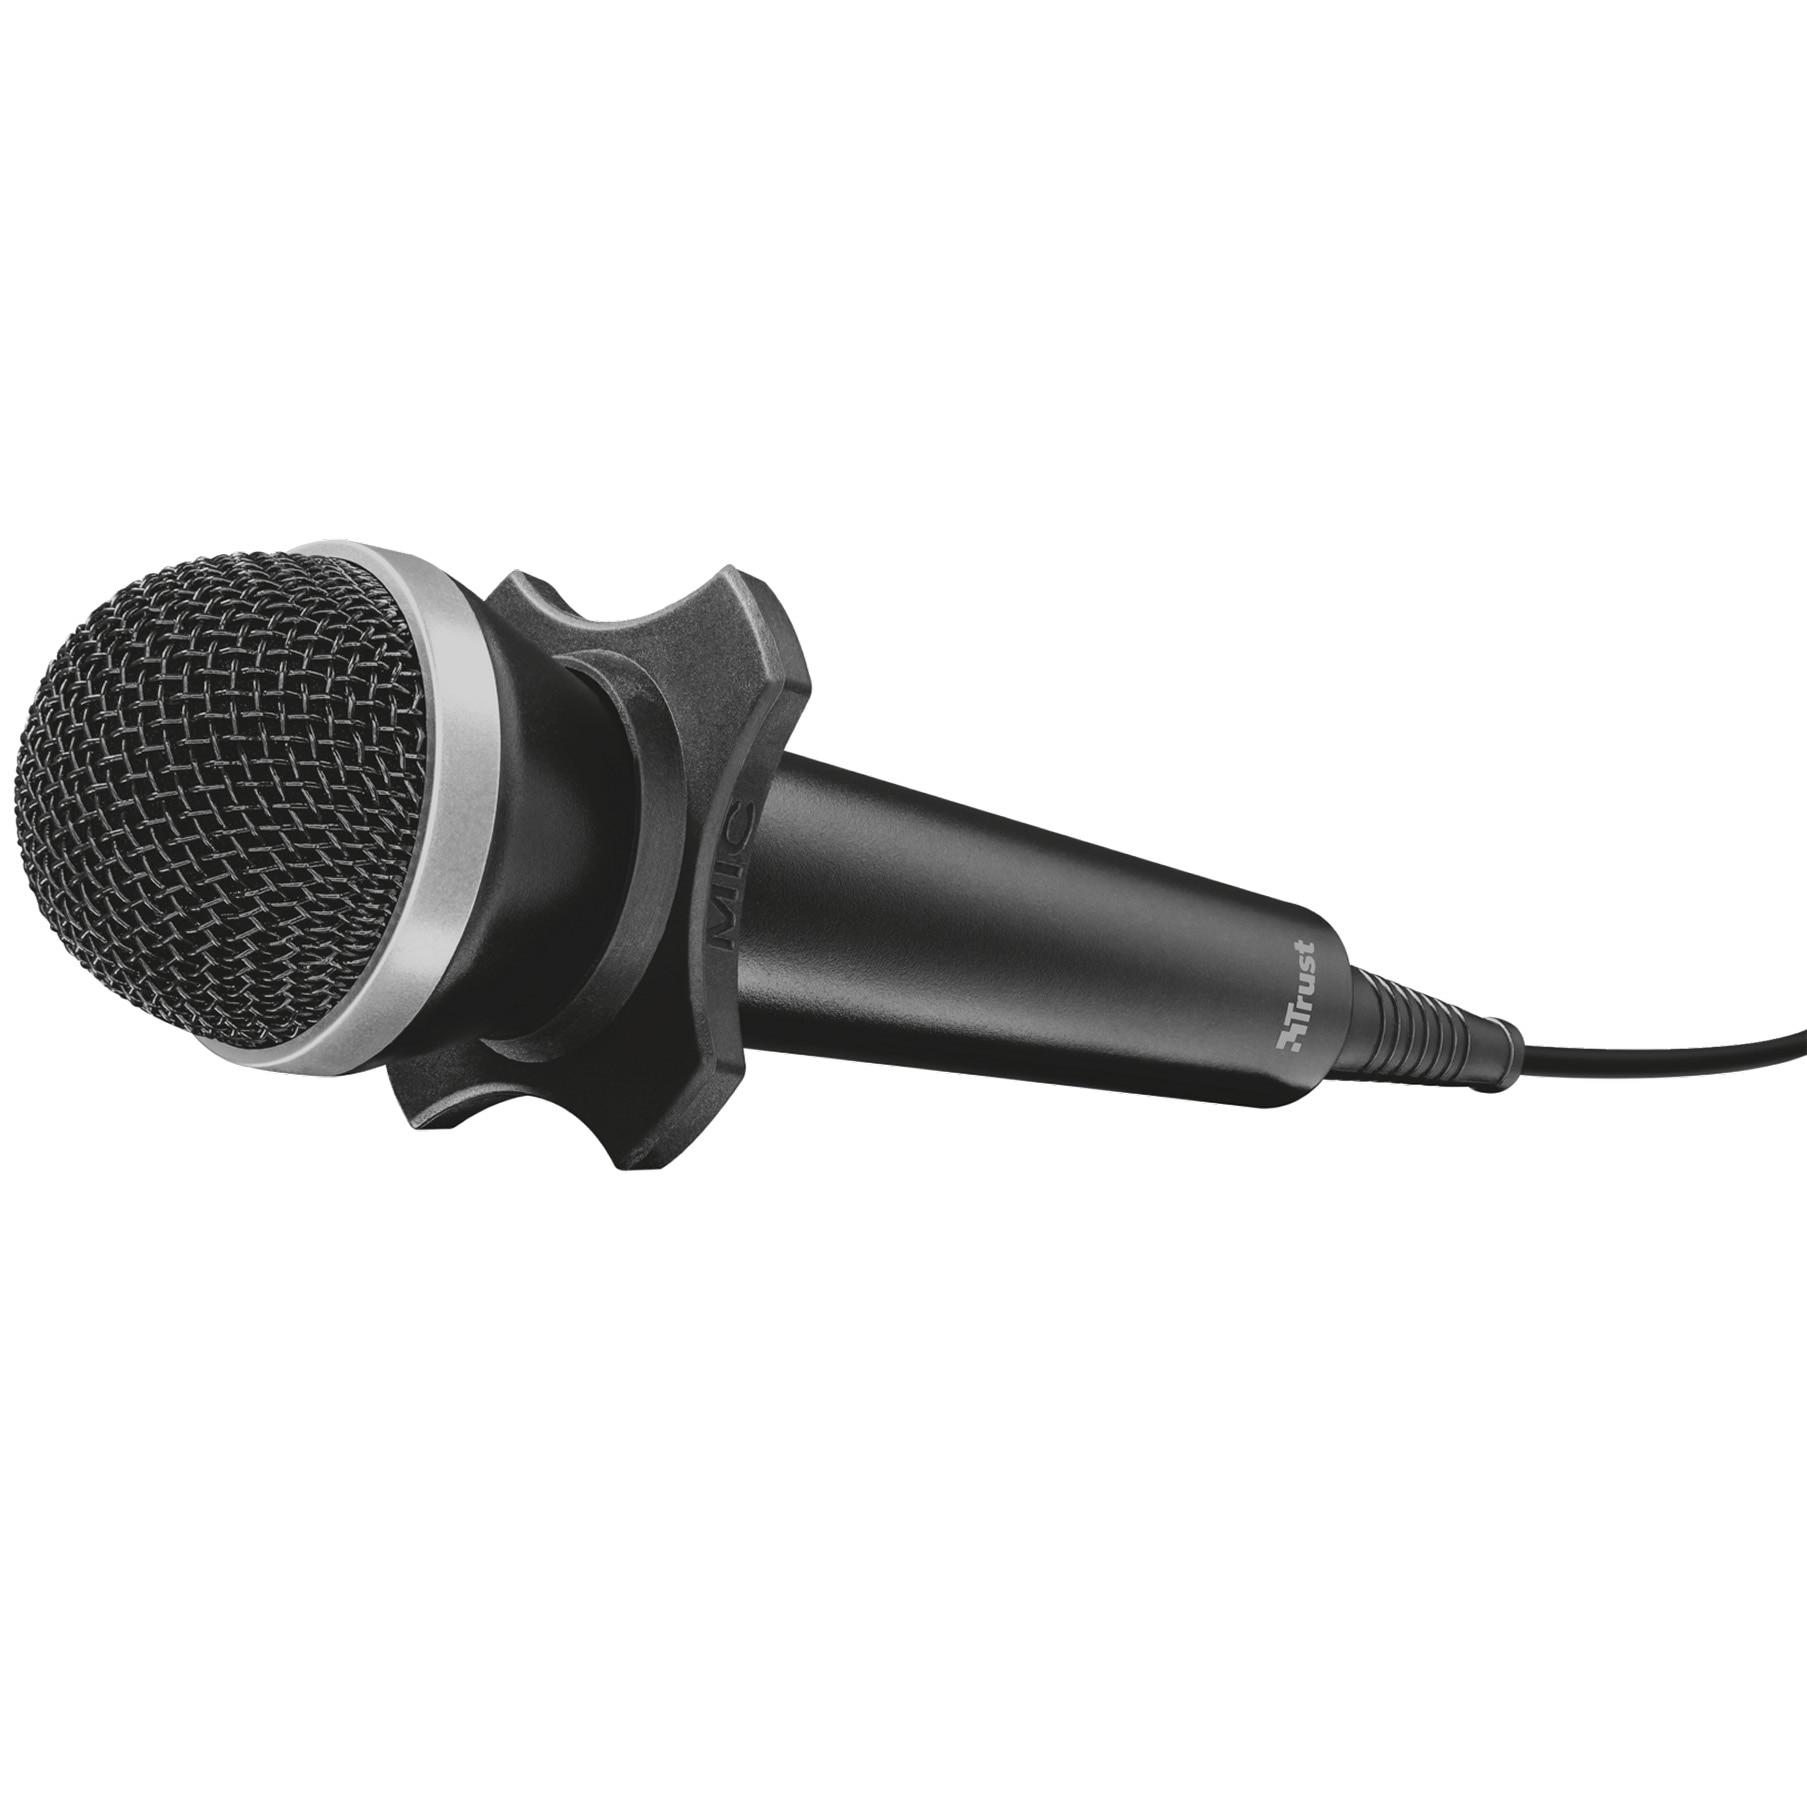 Fotografie Microfon Trust Starzz USB, Negru